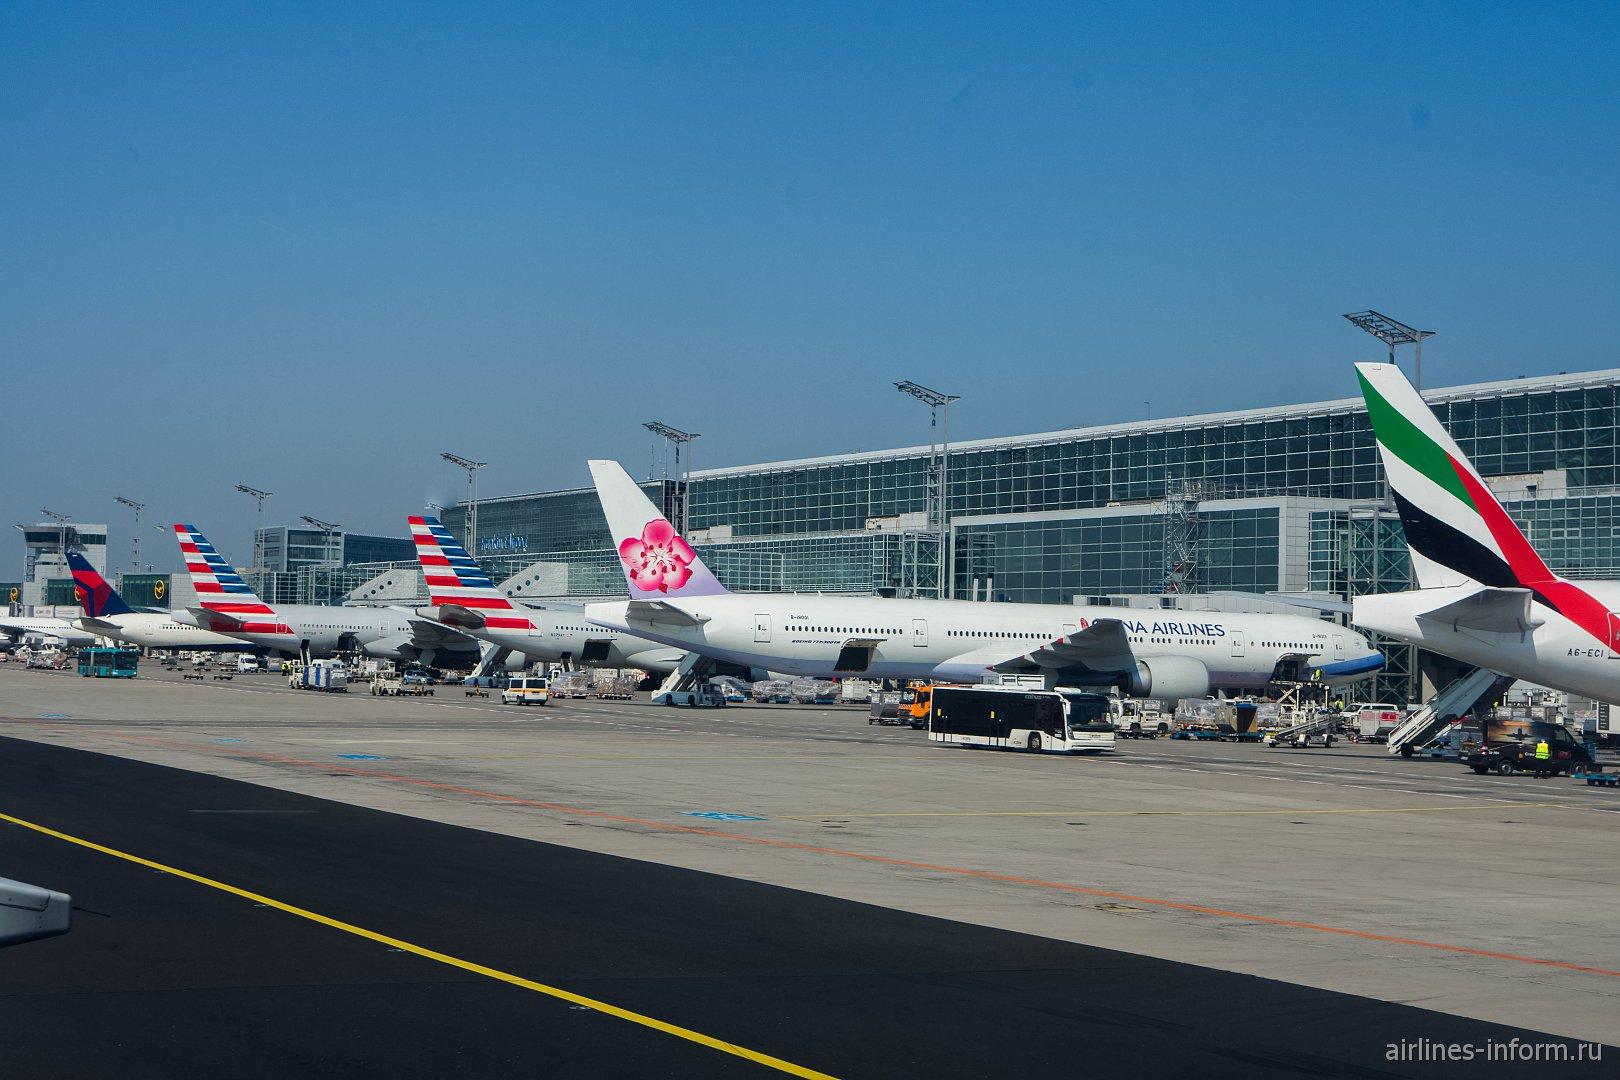 Самолеты у терминала 2 аэропорта Франкфурт